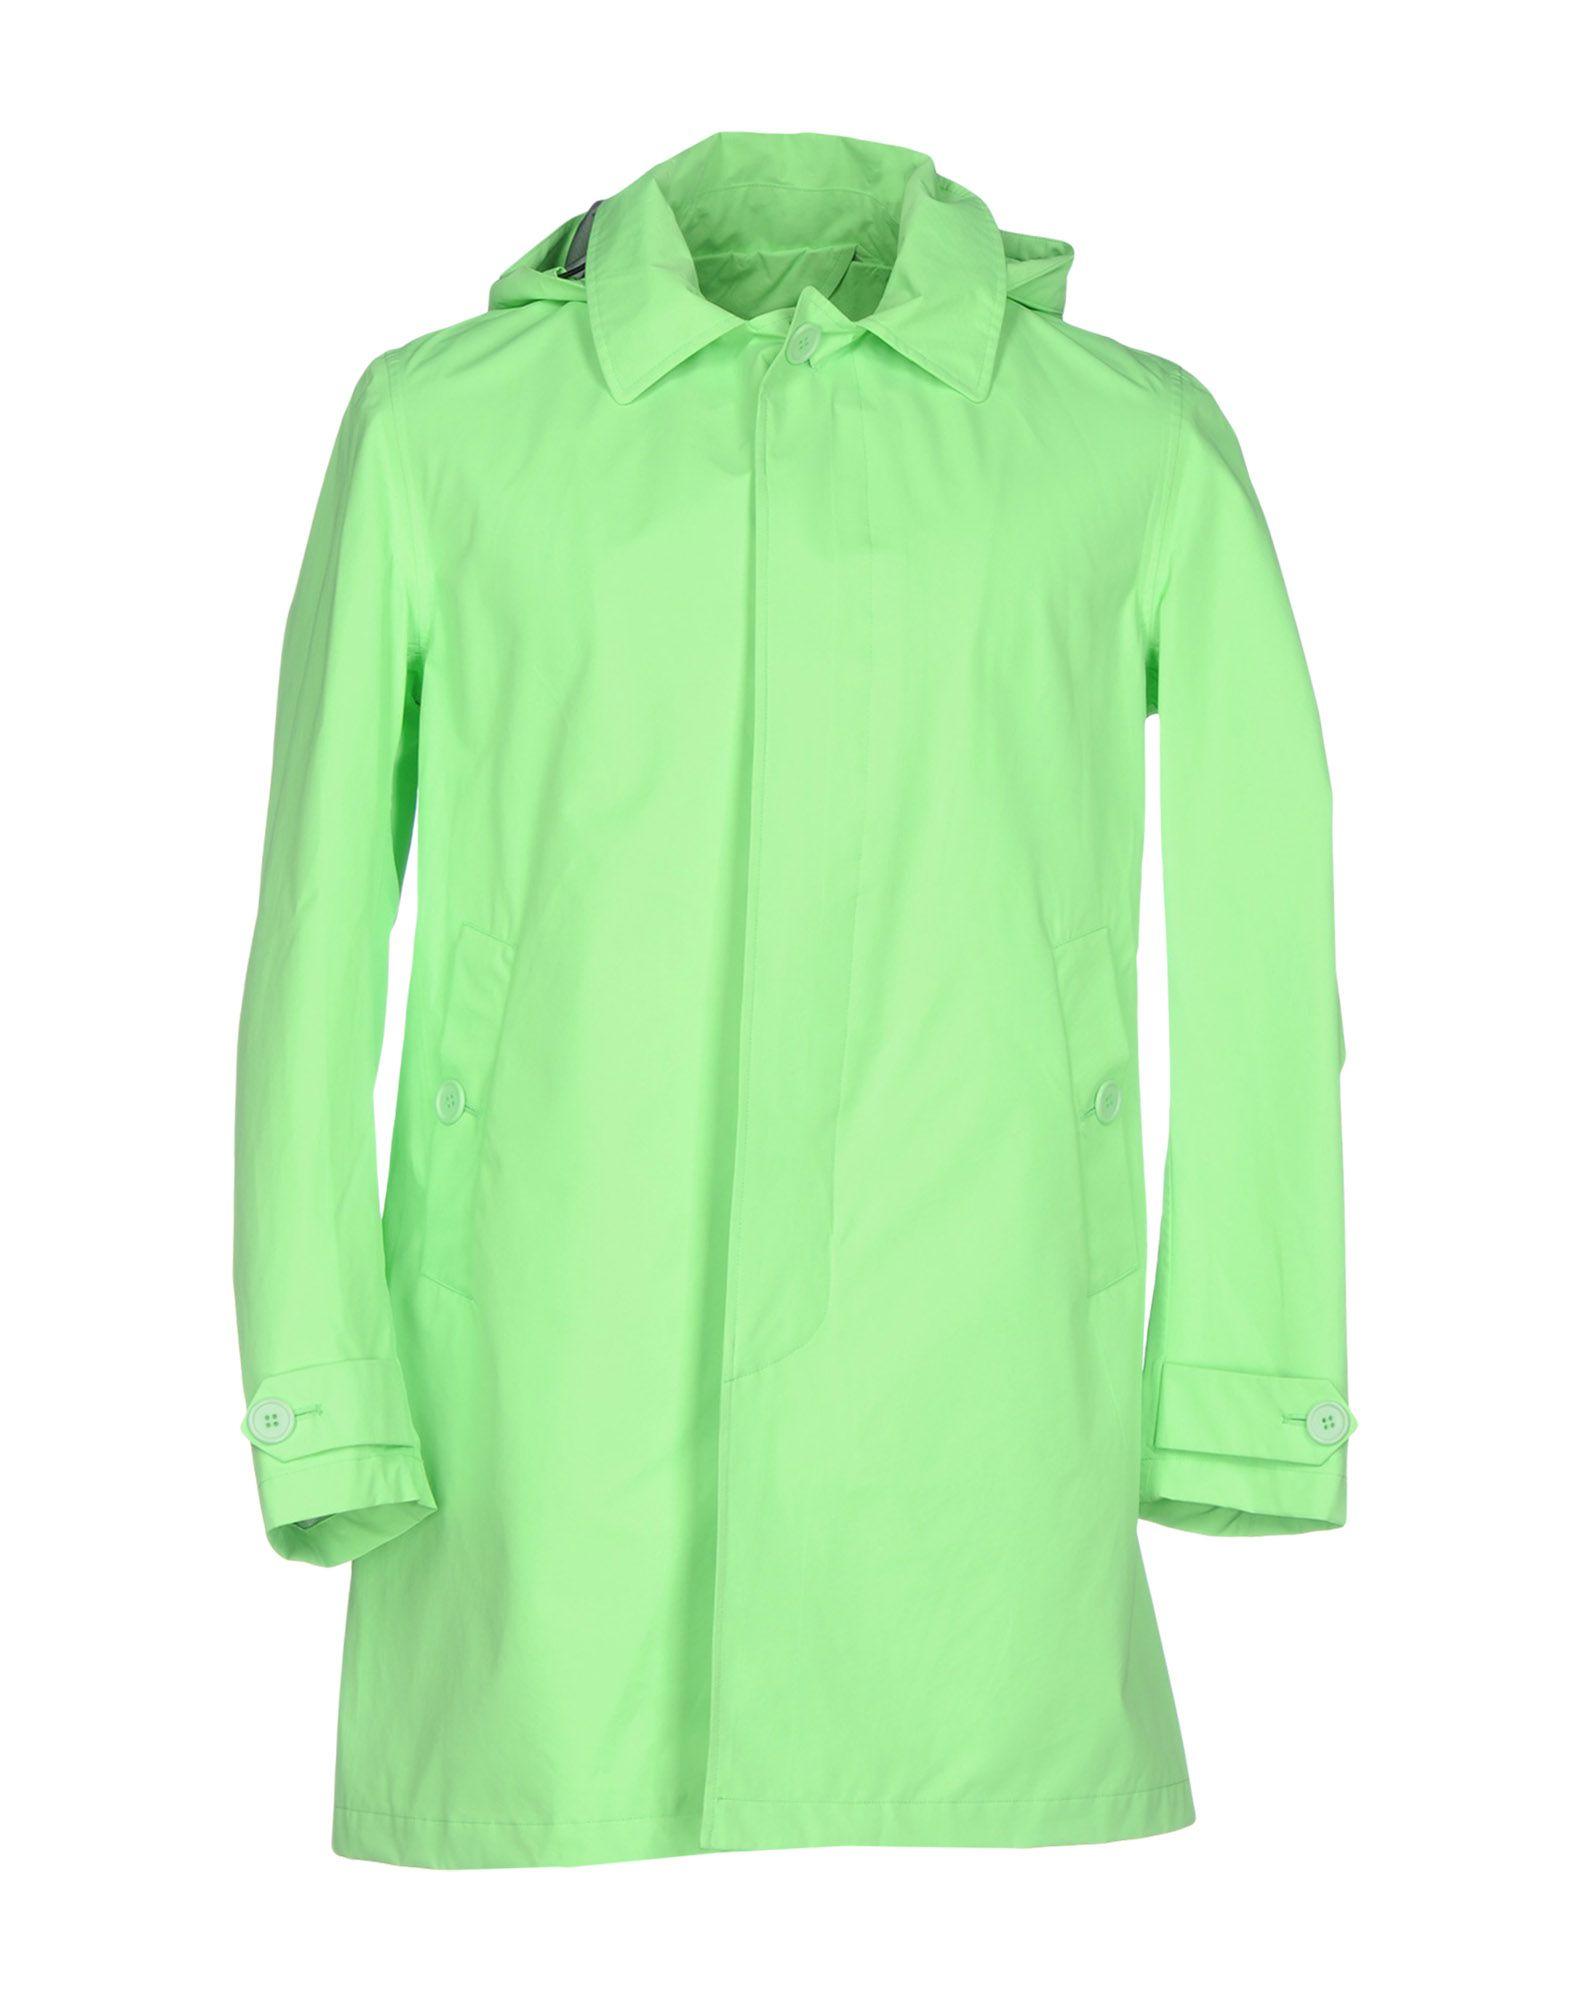 Impermeabile Bpd Be Proud Of This Dress Uomo - Acquista online su